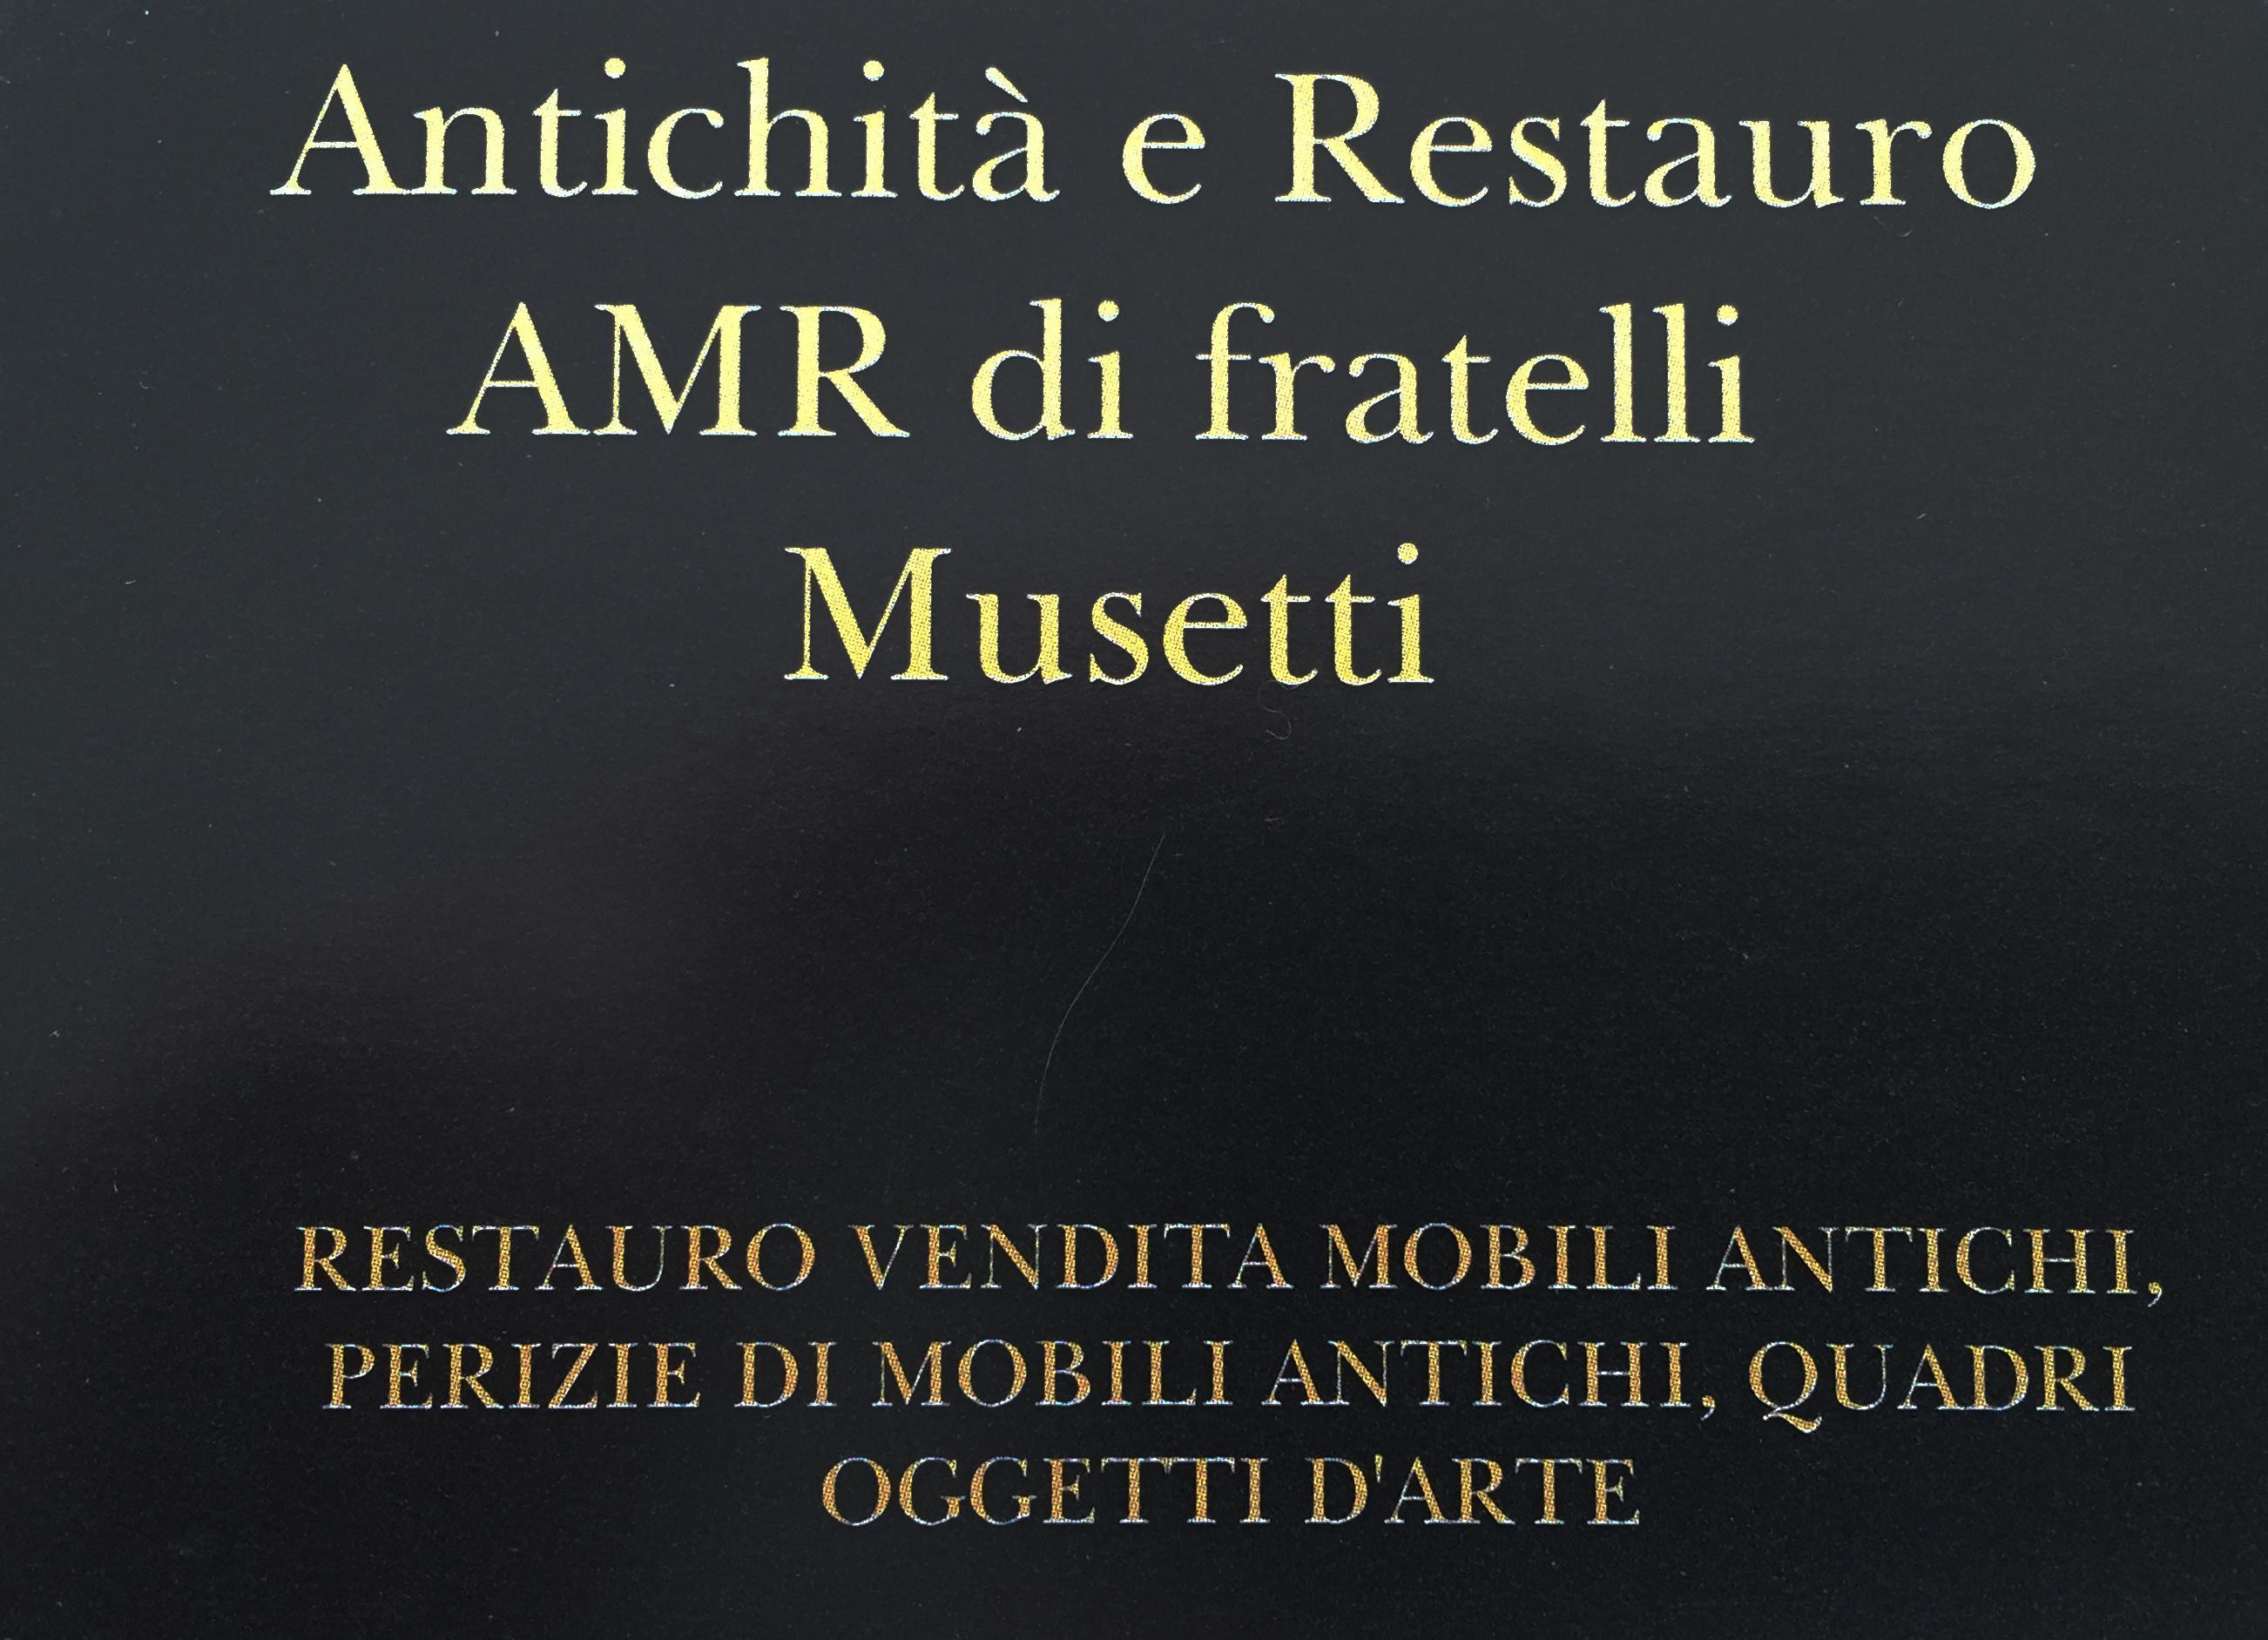 shabby chic - Vendita e Restauro - ARREDAMENTO MOBILI ANTIQUARIATO ...